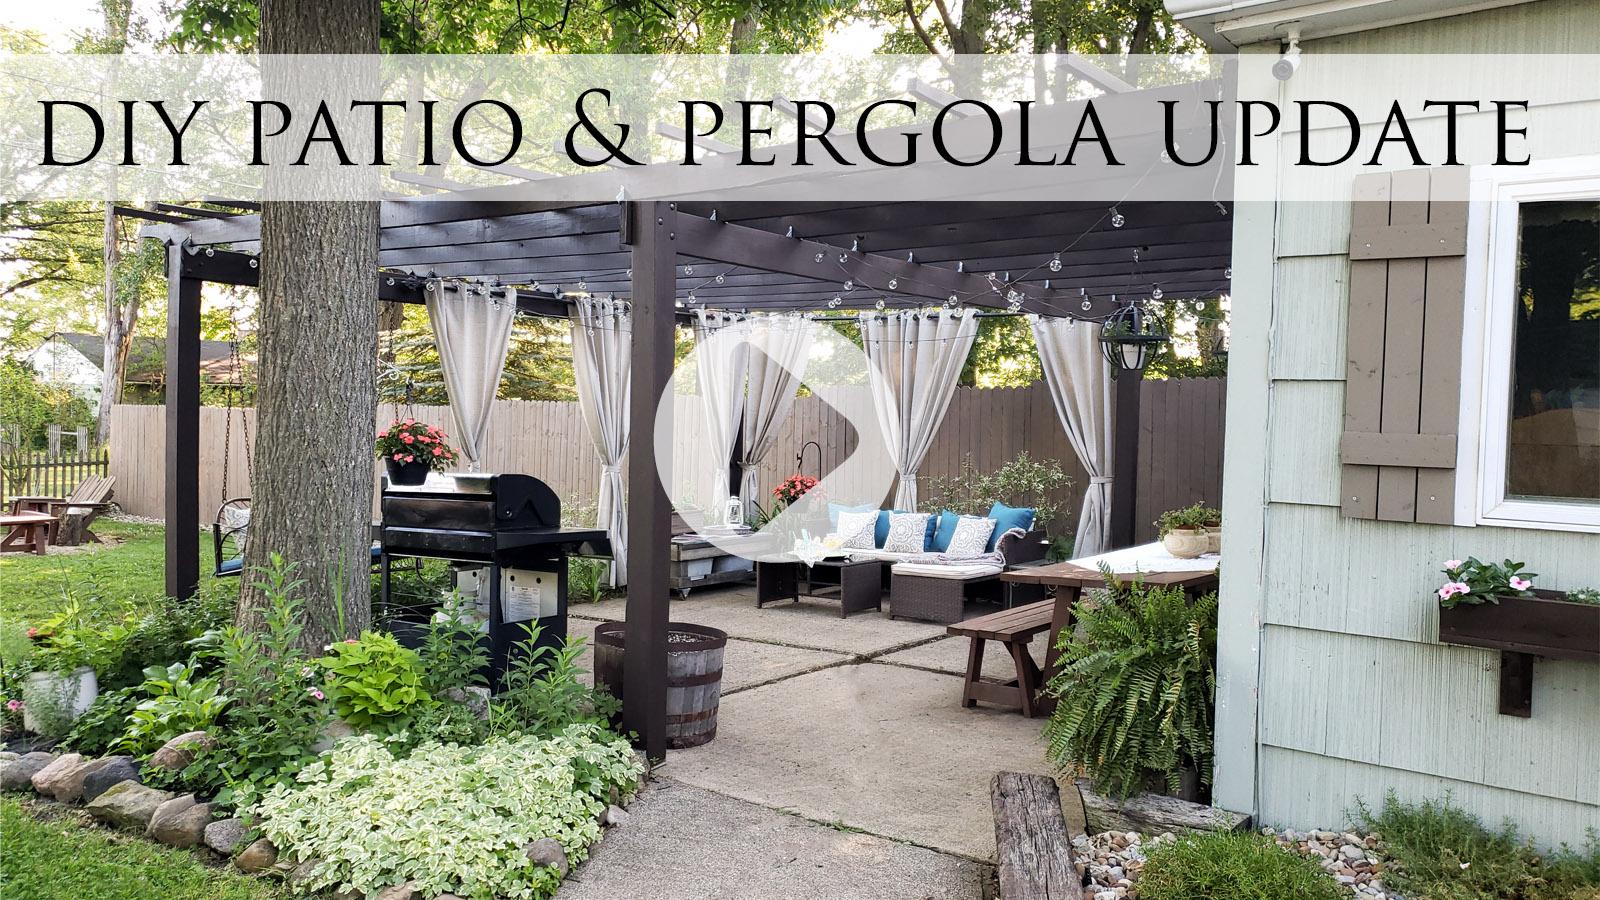 DIY Patio & Pergola Update with Video Tour by Larissa of Prodigal Pieces | prodigalpieces.com